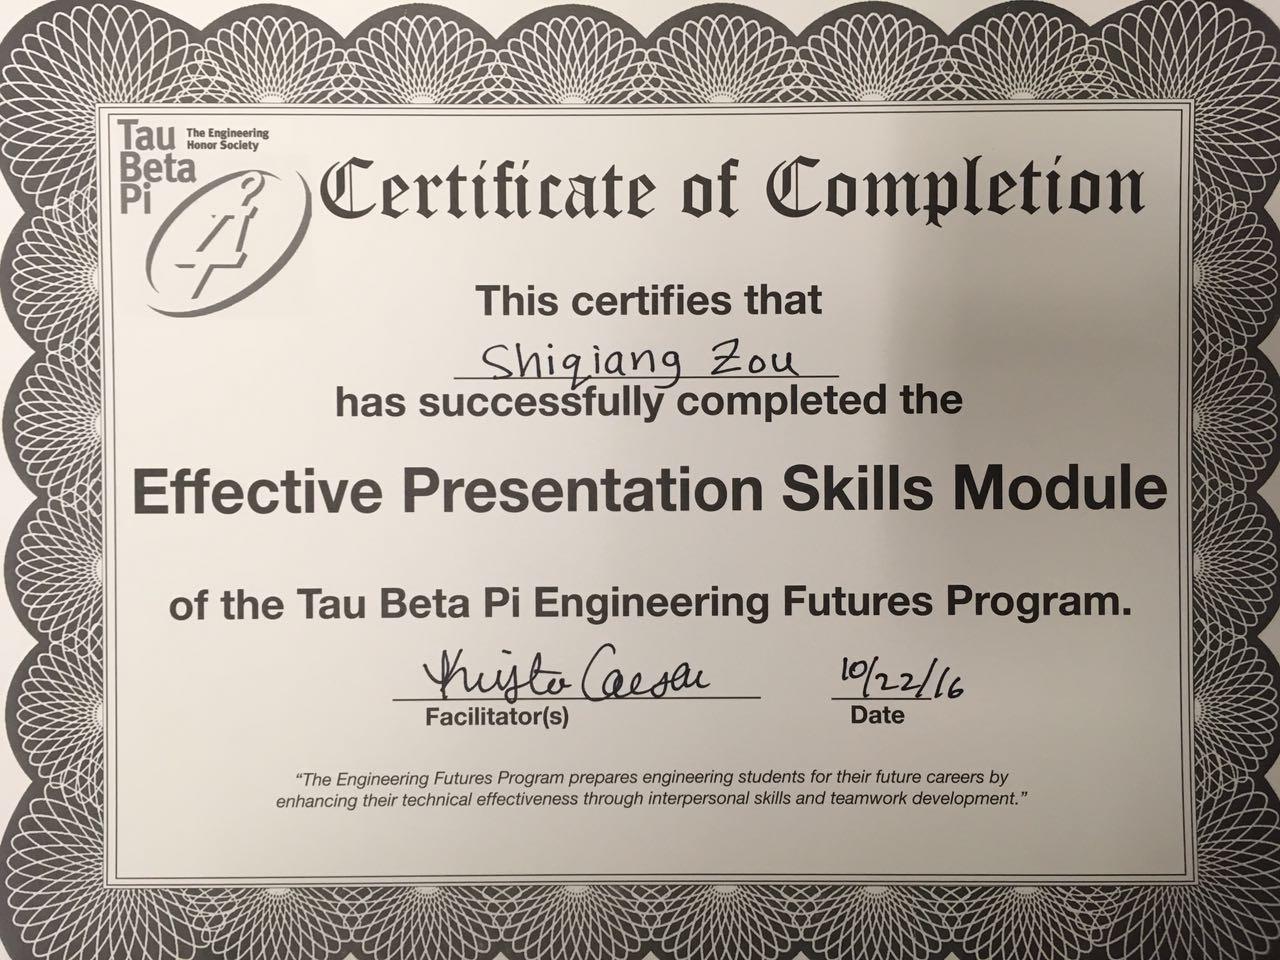 tbp-certificate